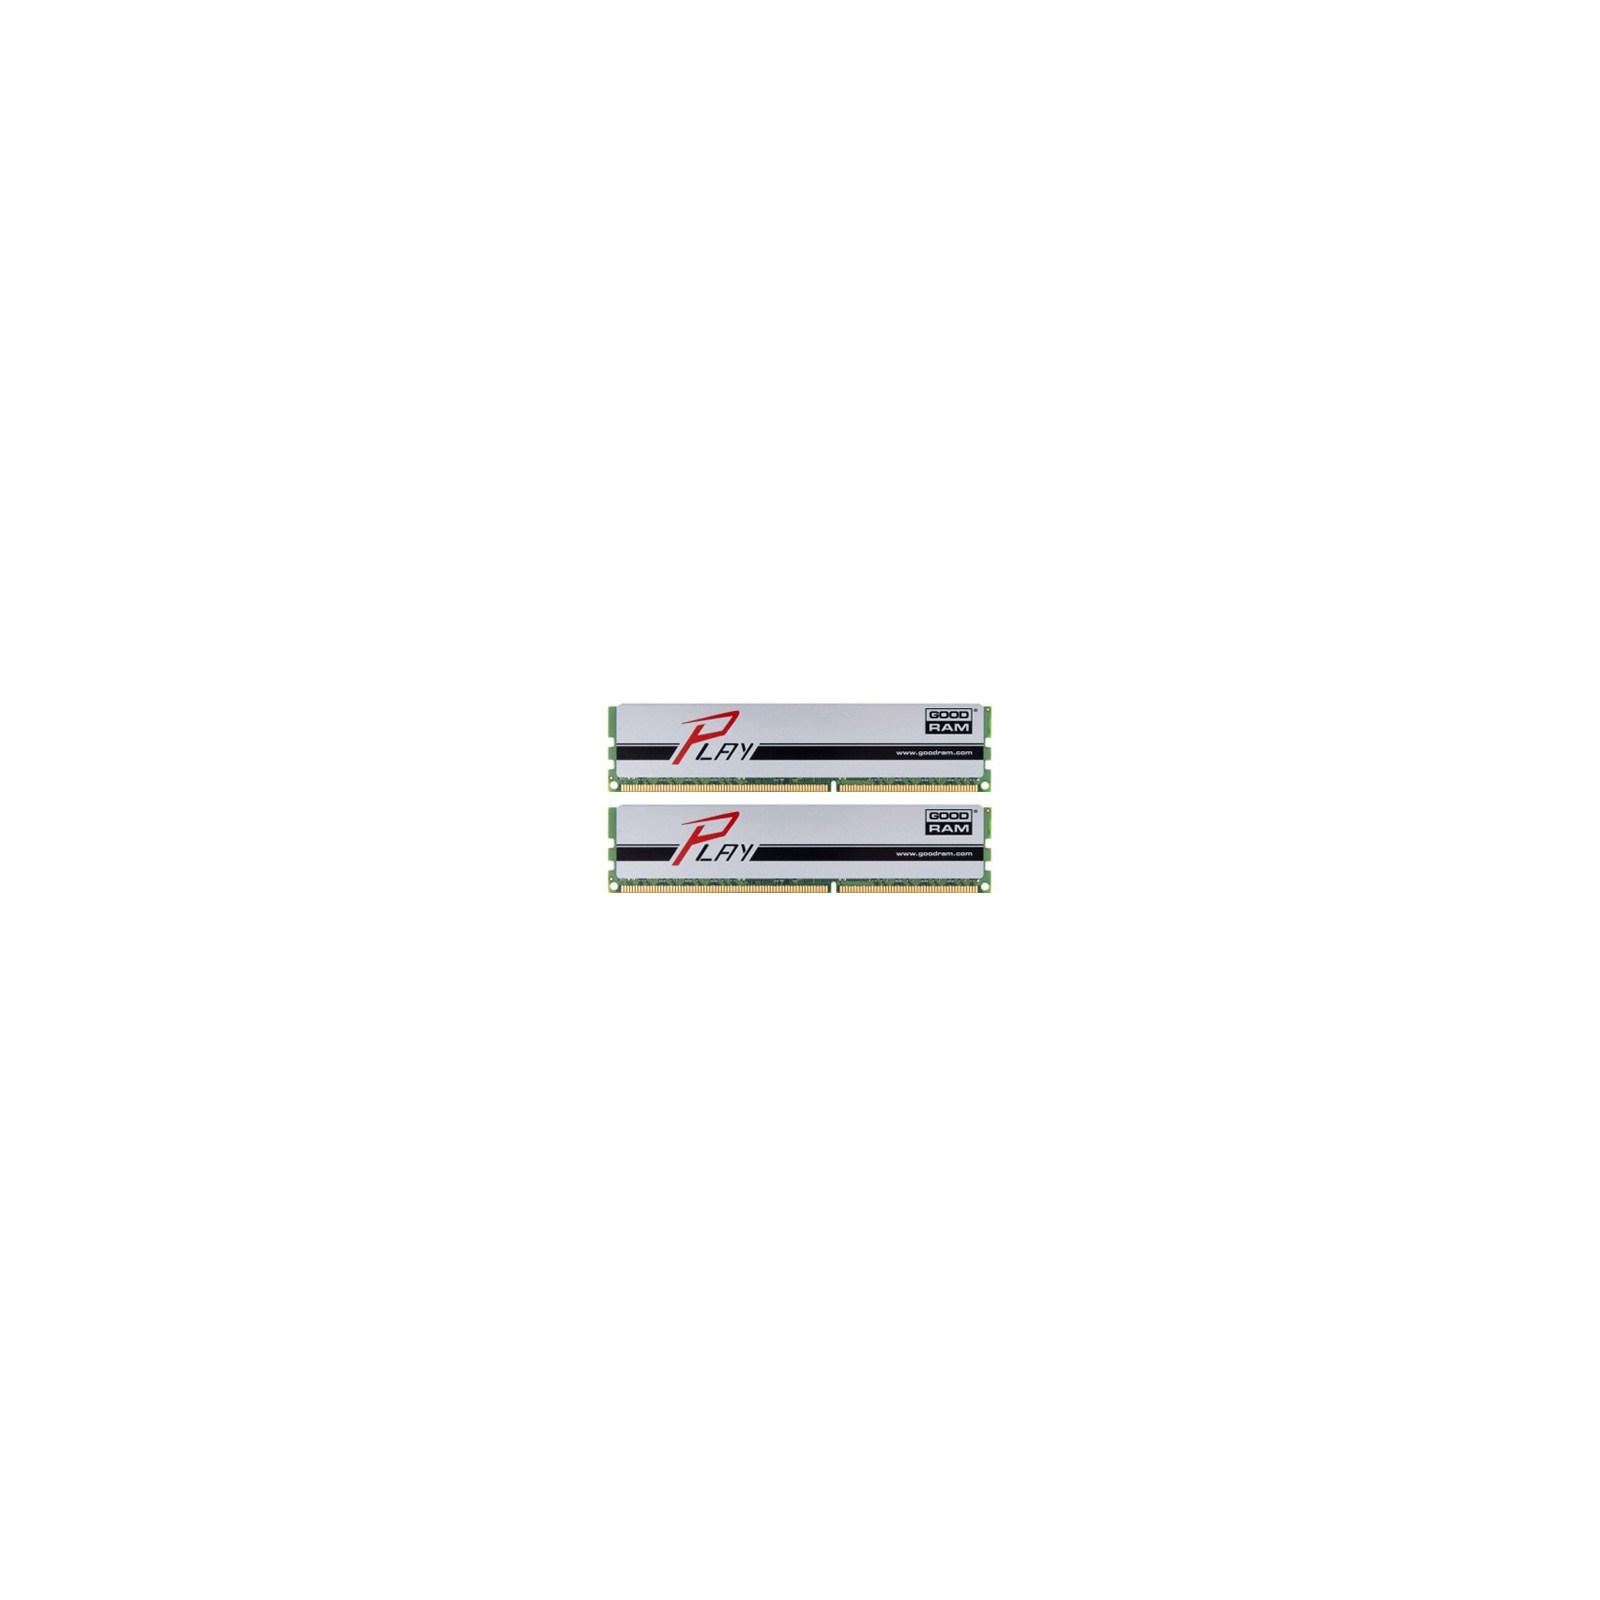 Модуль памяти для компьютера DDR3 16GB (2x8GB) 1600 MHz GOODRAM (GYS1600D364L10/16GDC)